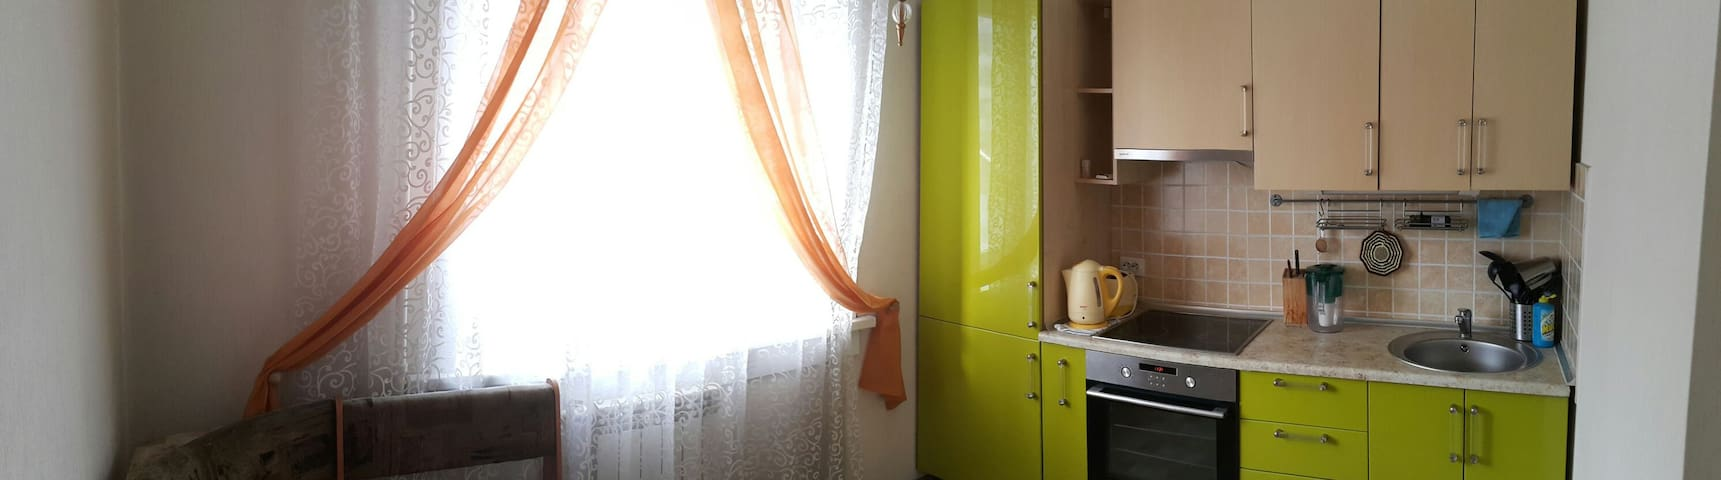 Уютная однокомнатная в центре Бердска - Berdsk - Lägenhet